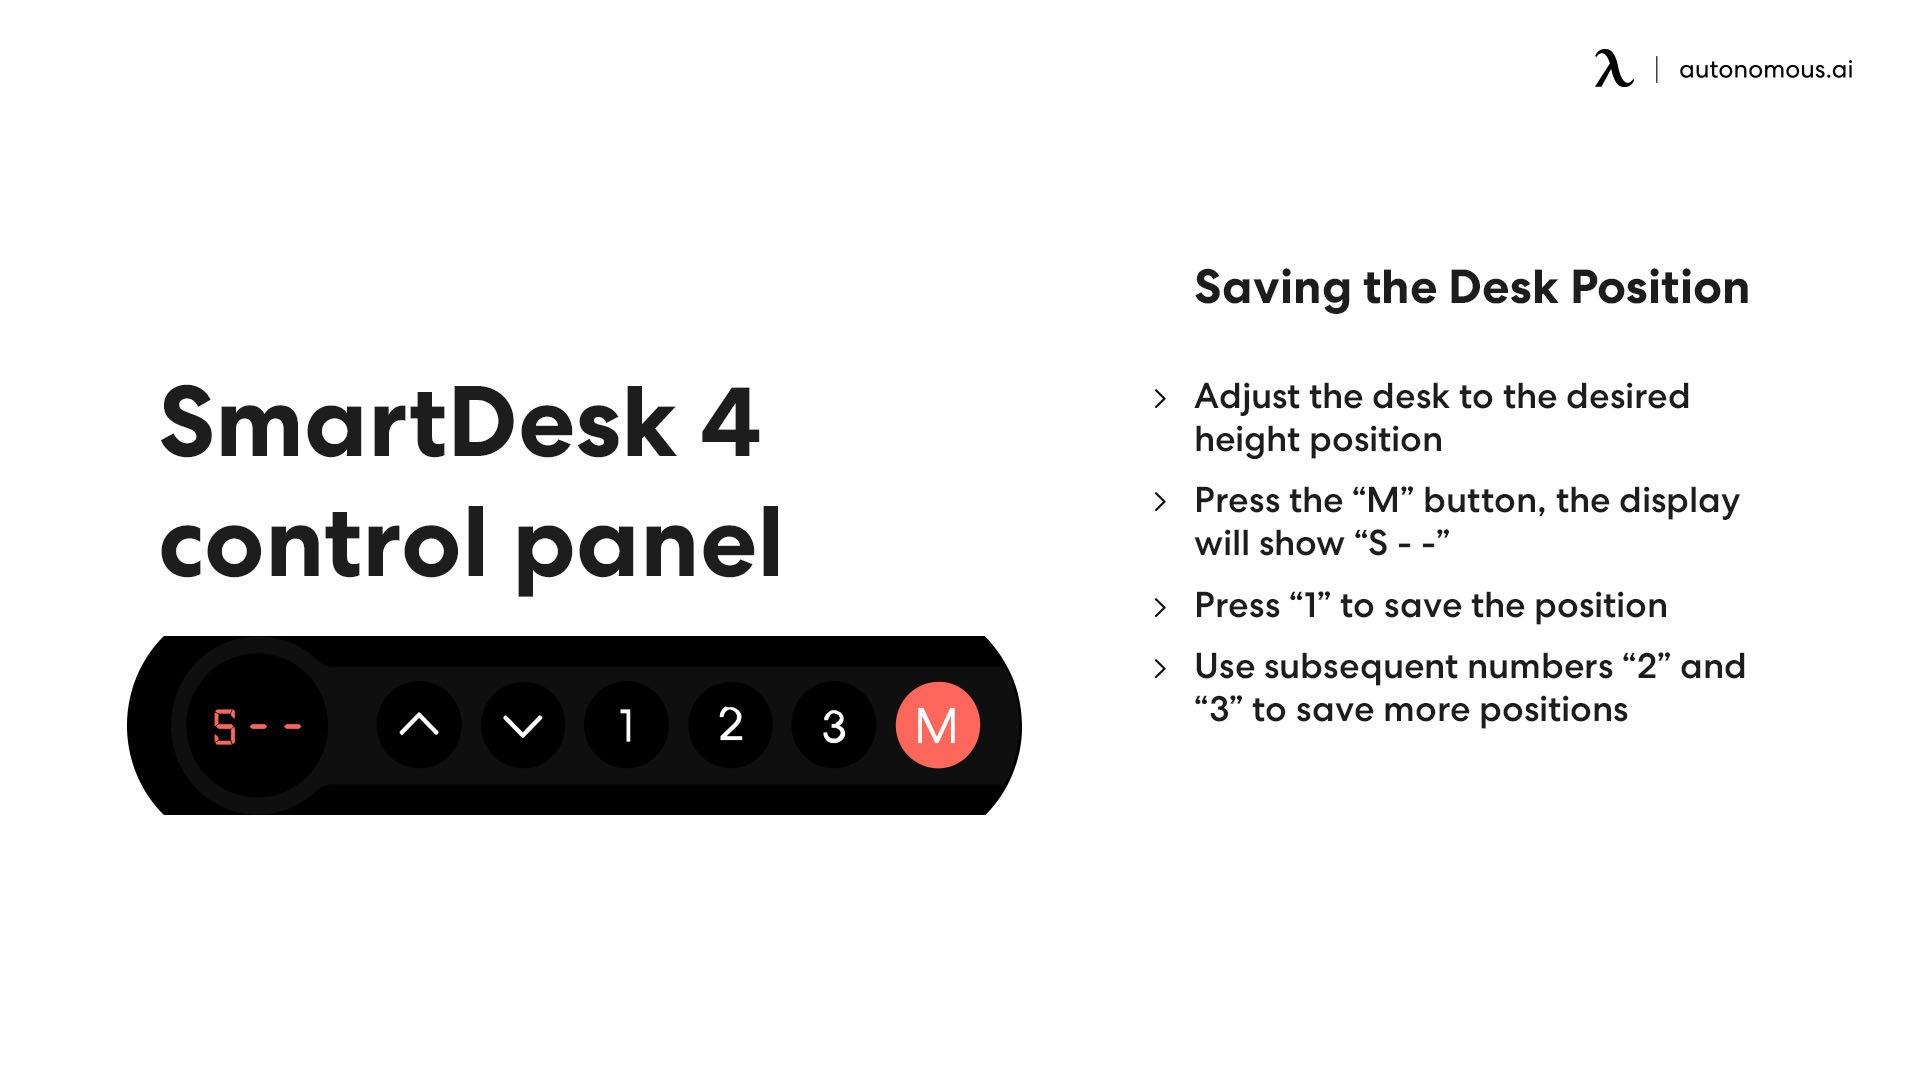 Saving the desk position